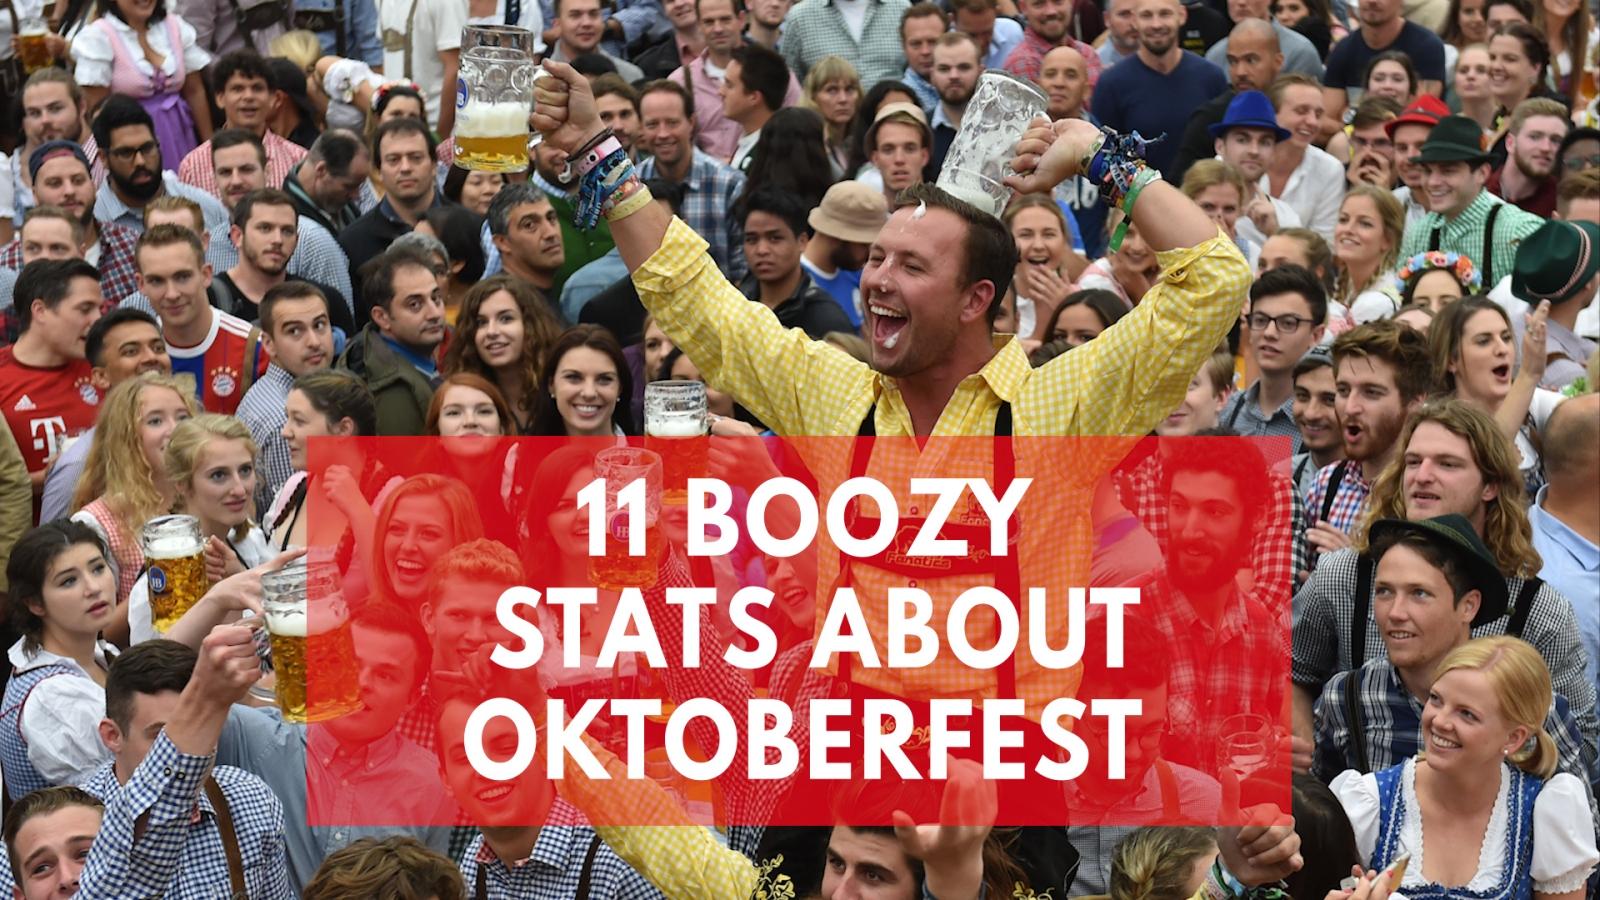 11 boozy stats about Oktoberfest